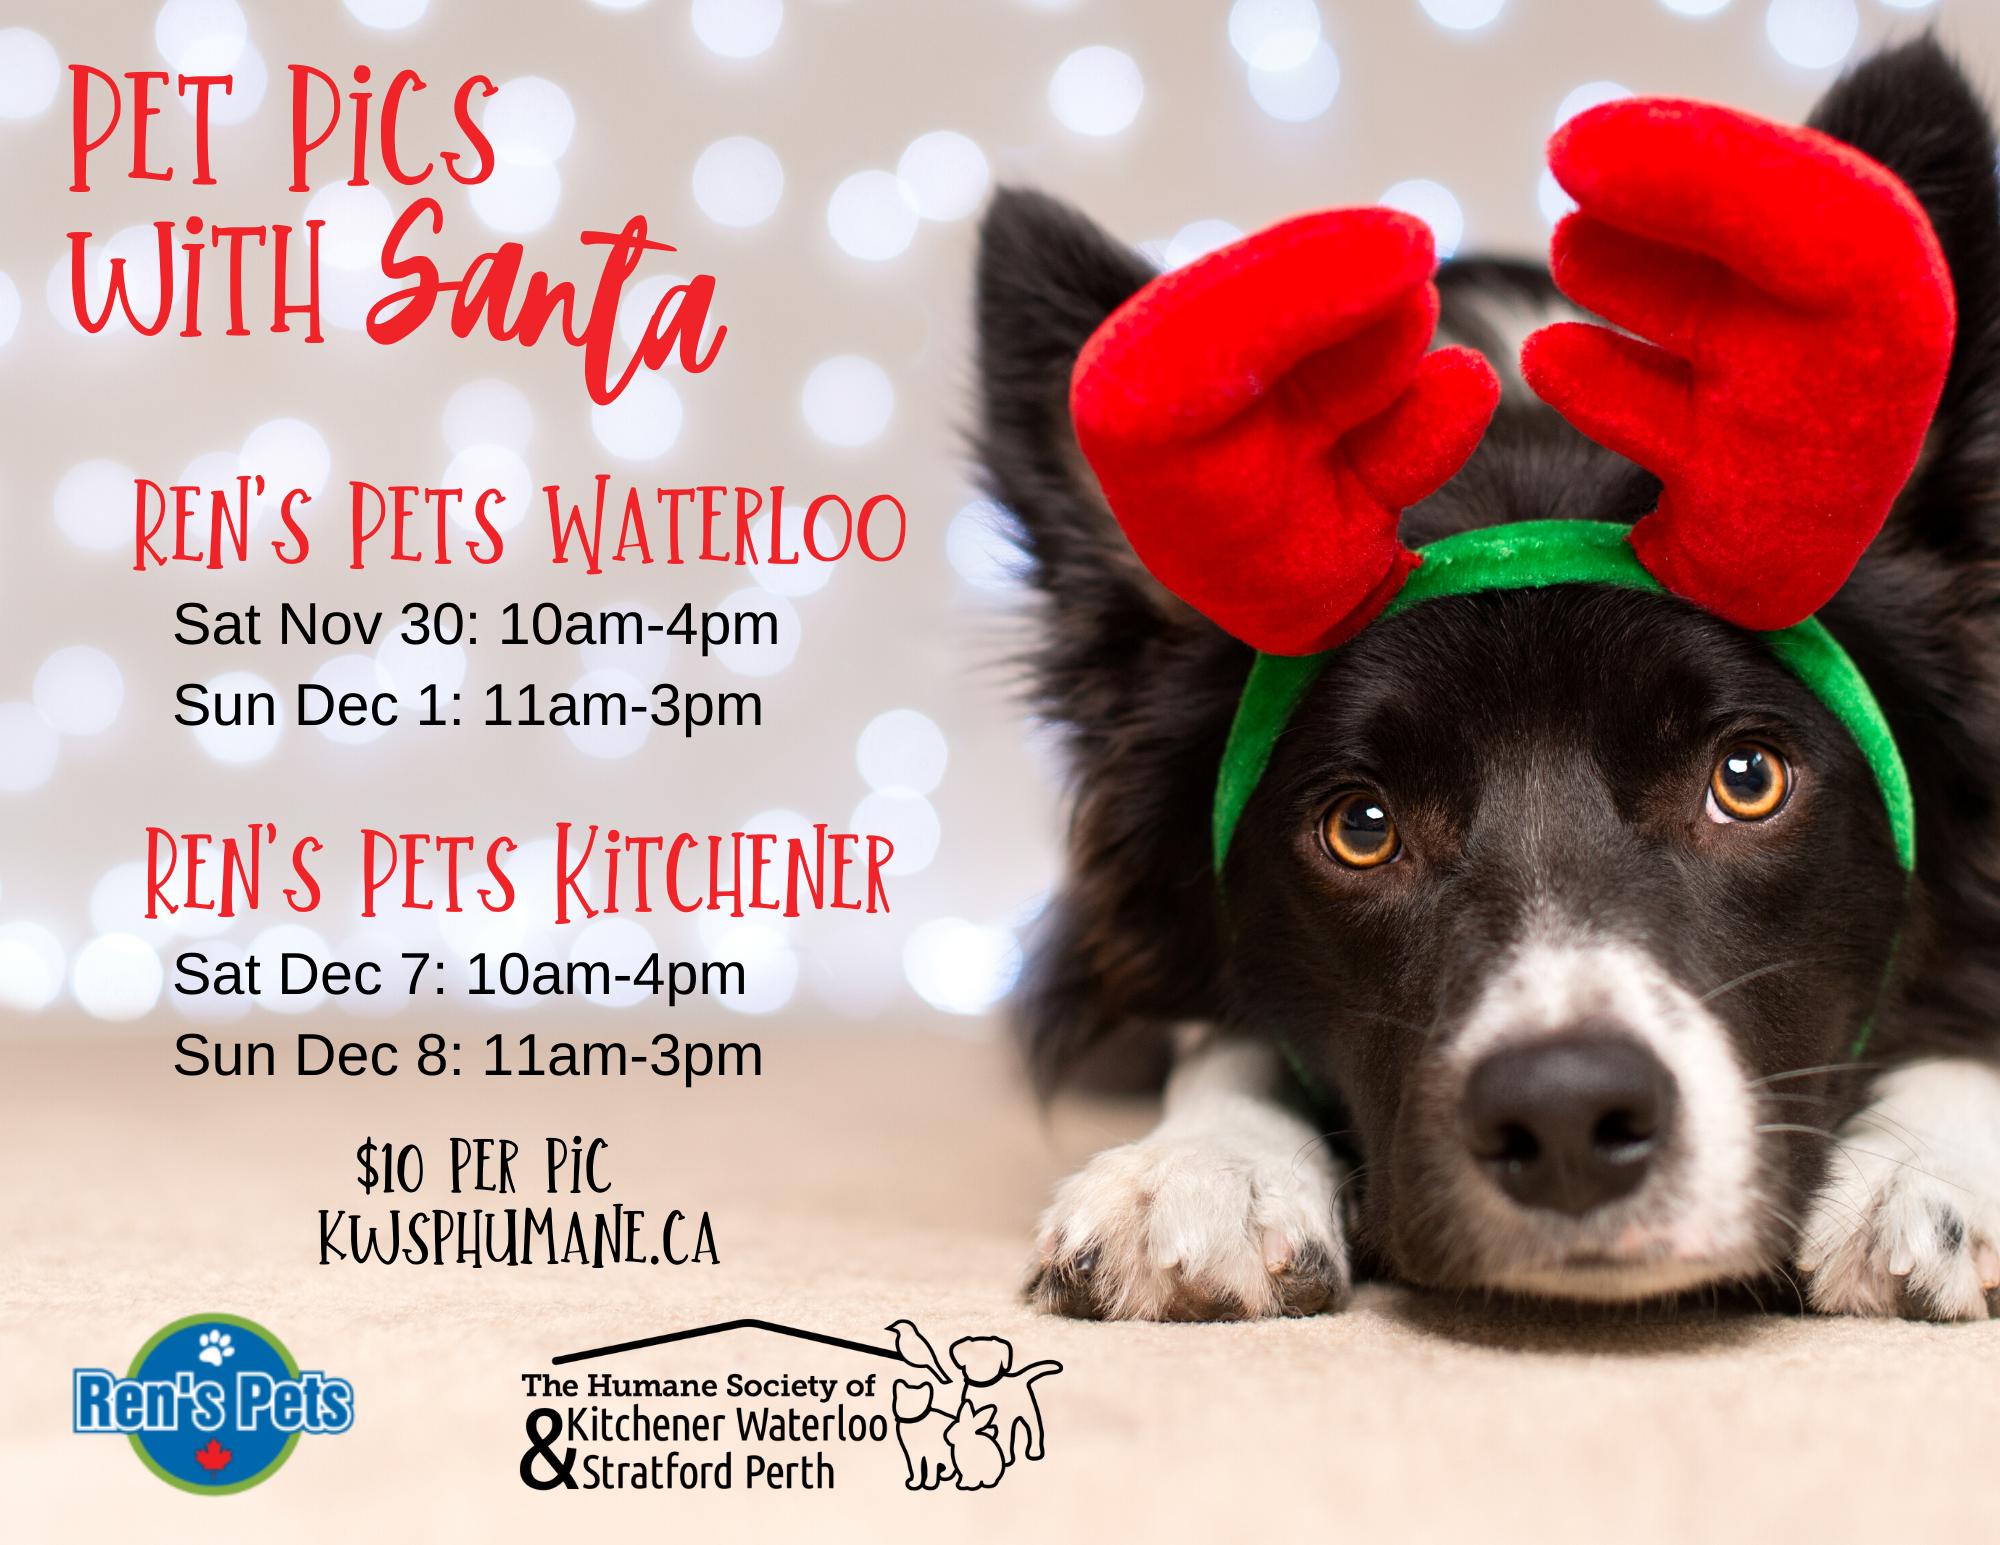 Pet Pics with Santa at Ren's Pets Kitchener